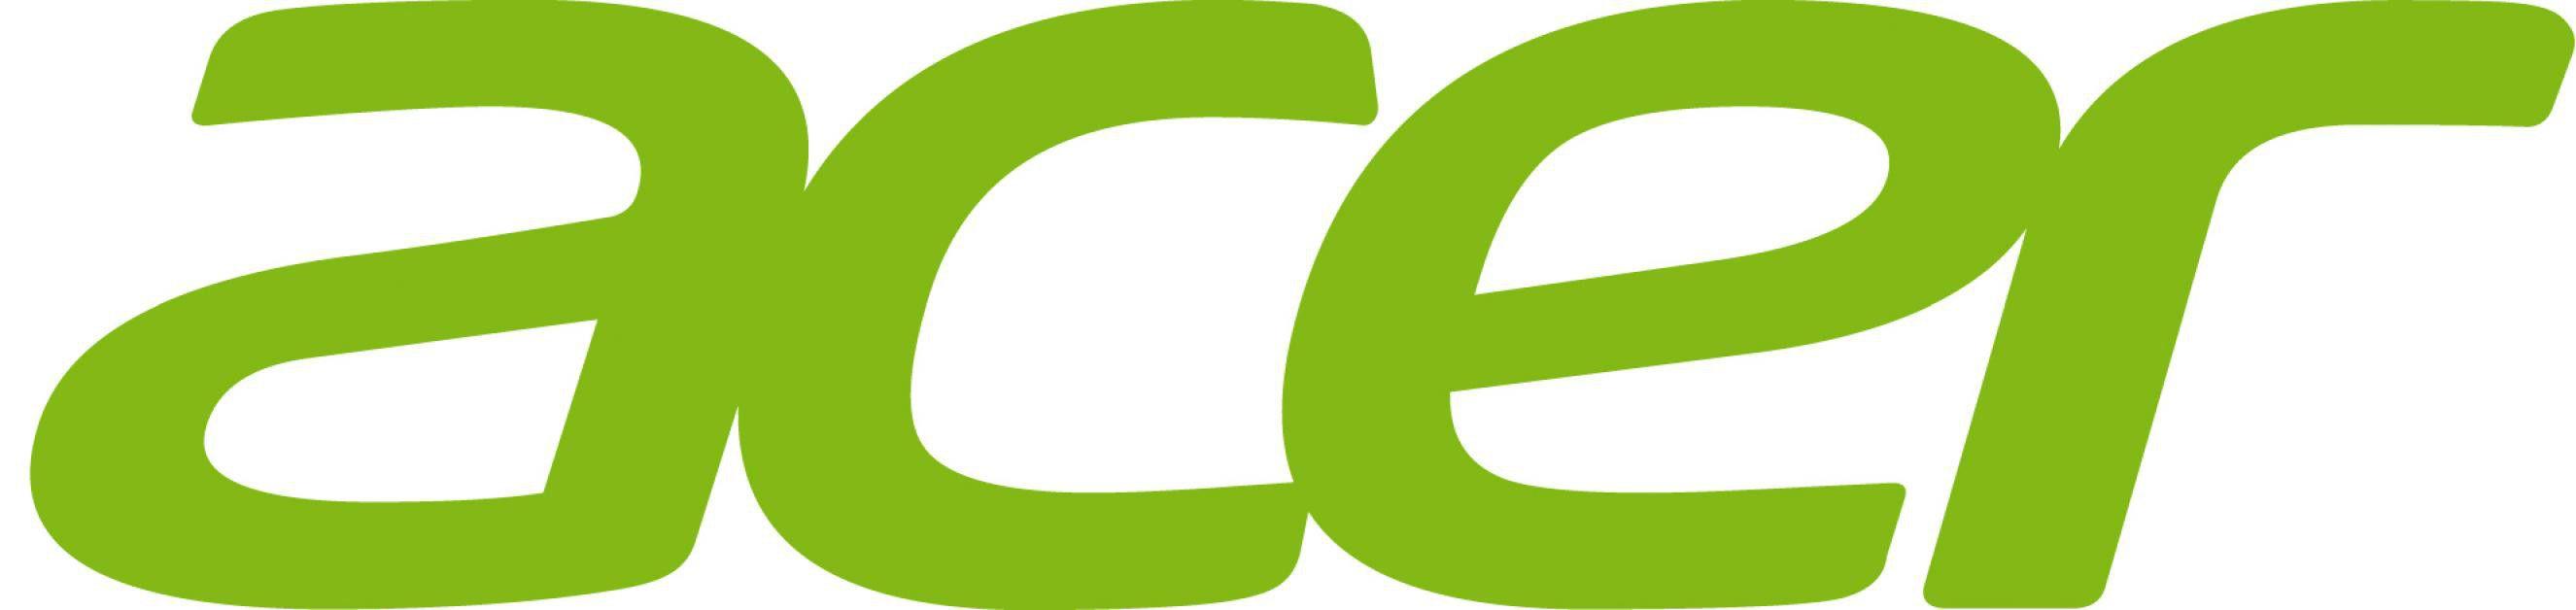 Acer Computing (logo)